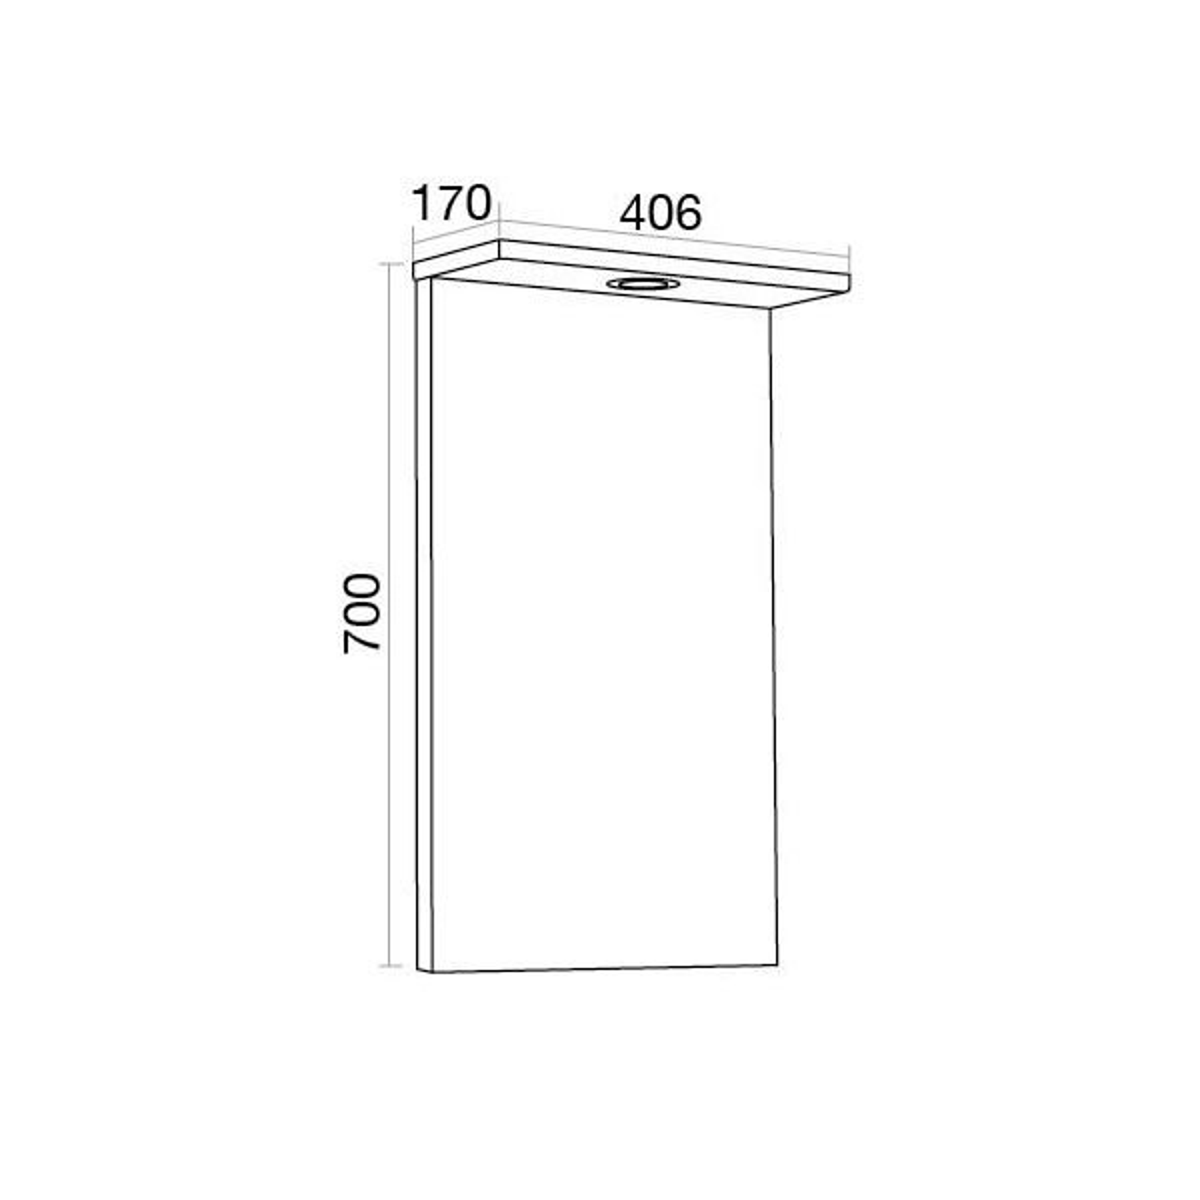 Elation Ikoma Bodega Grey Mirror 450mm Dimensions